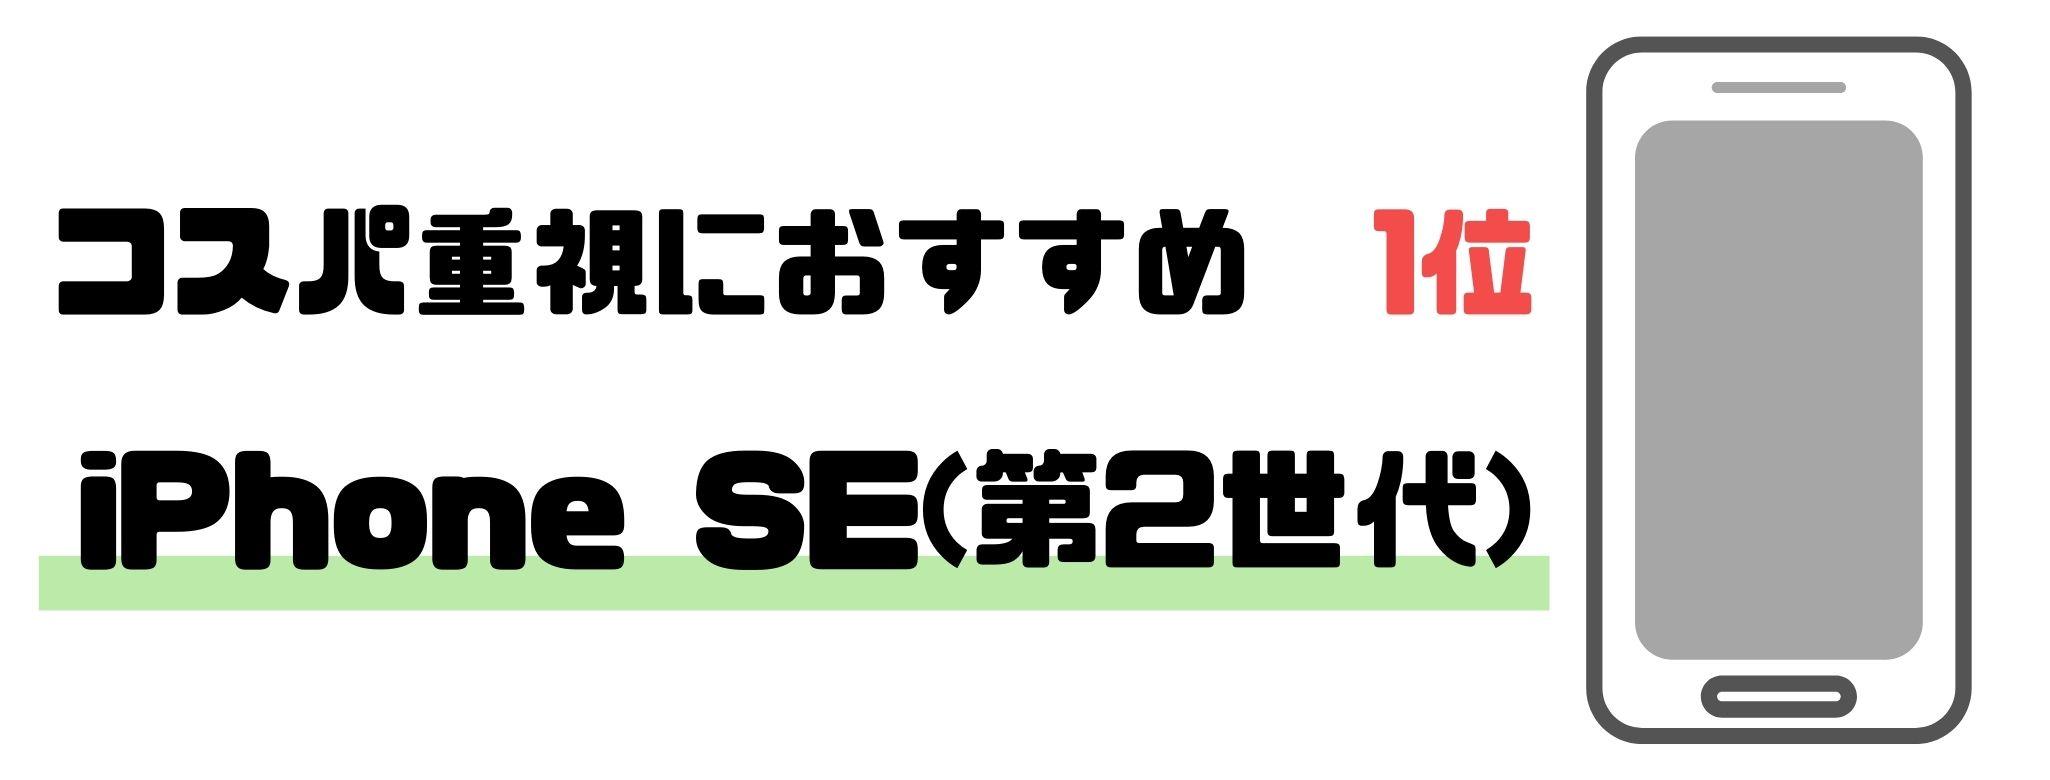 iPhone_おすすめ_コスパ1